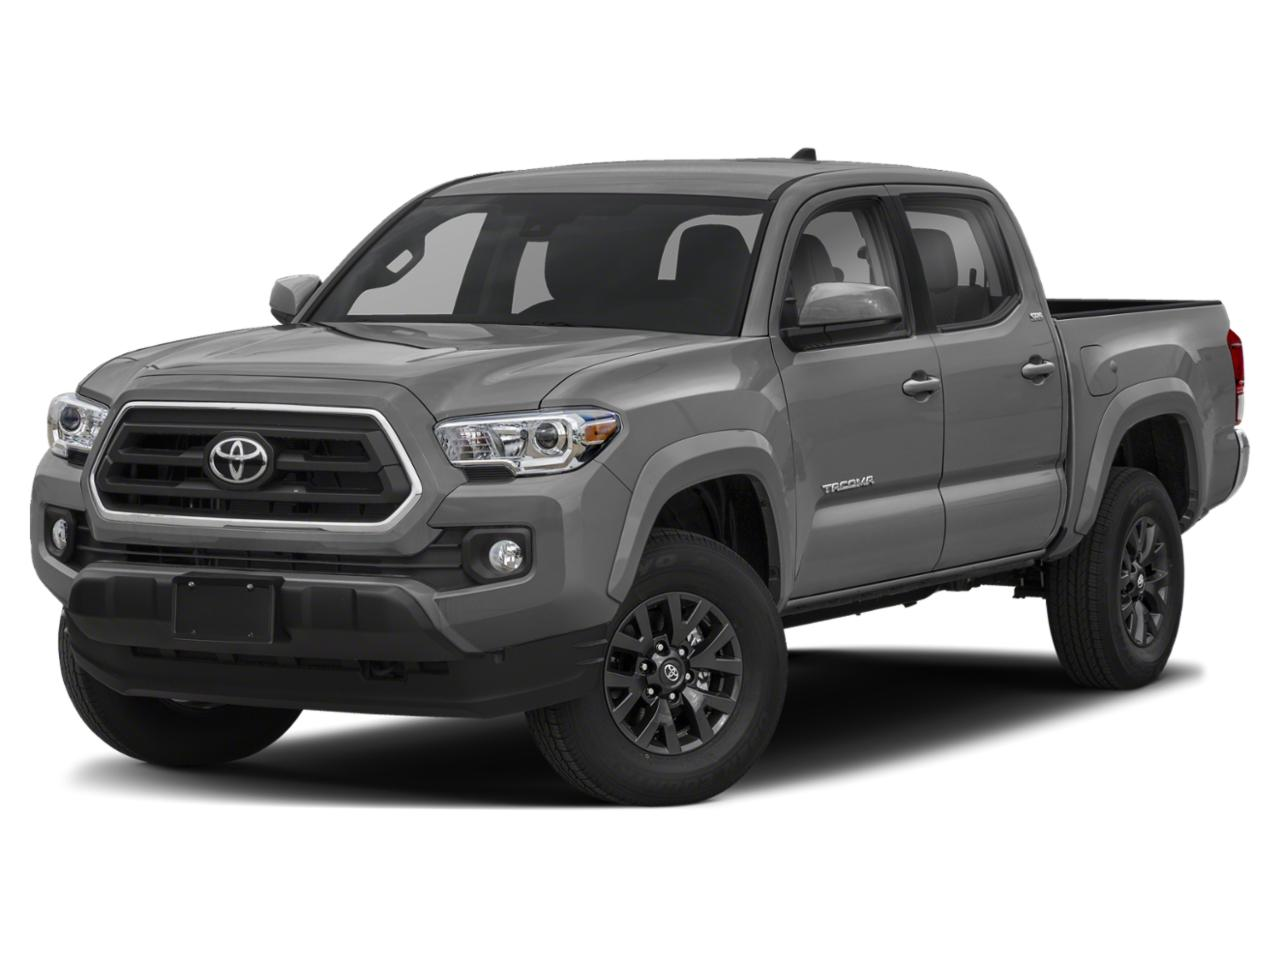 2020 Toyota Tacoma 2WD Vehicle Photo in Killeen, TX 76541